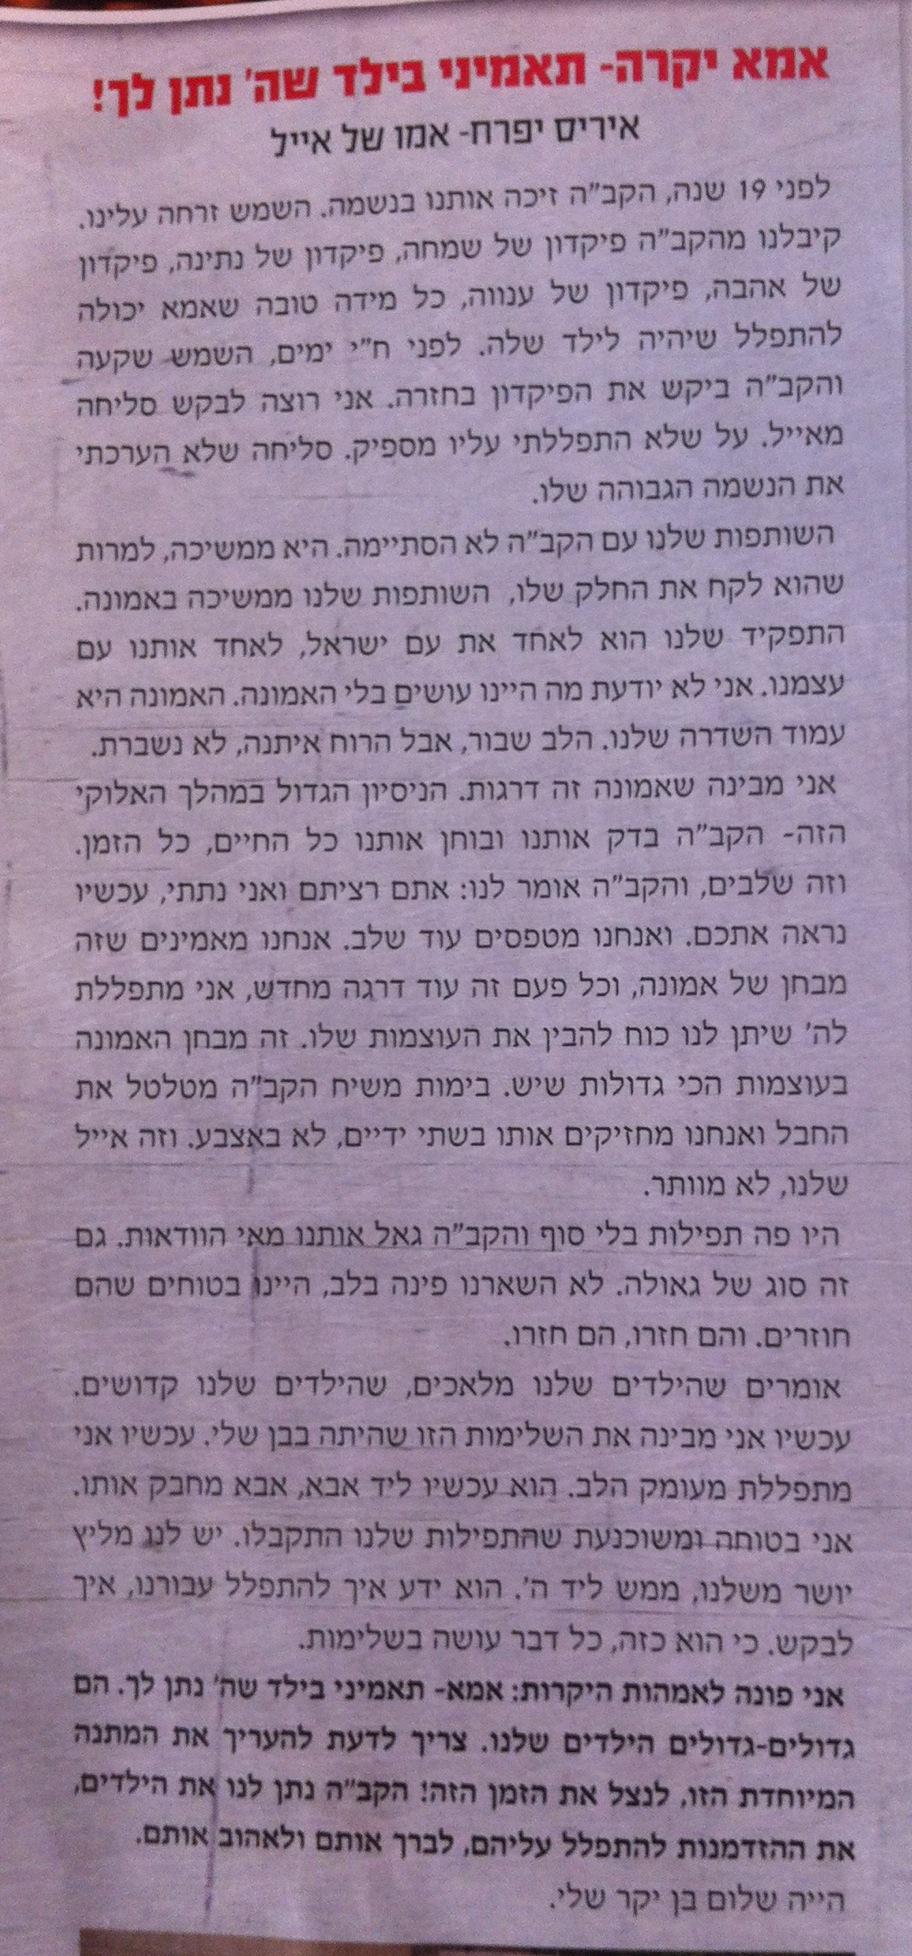 yifrach letter